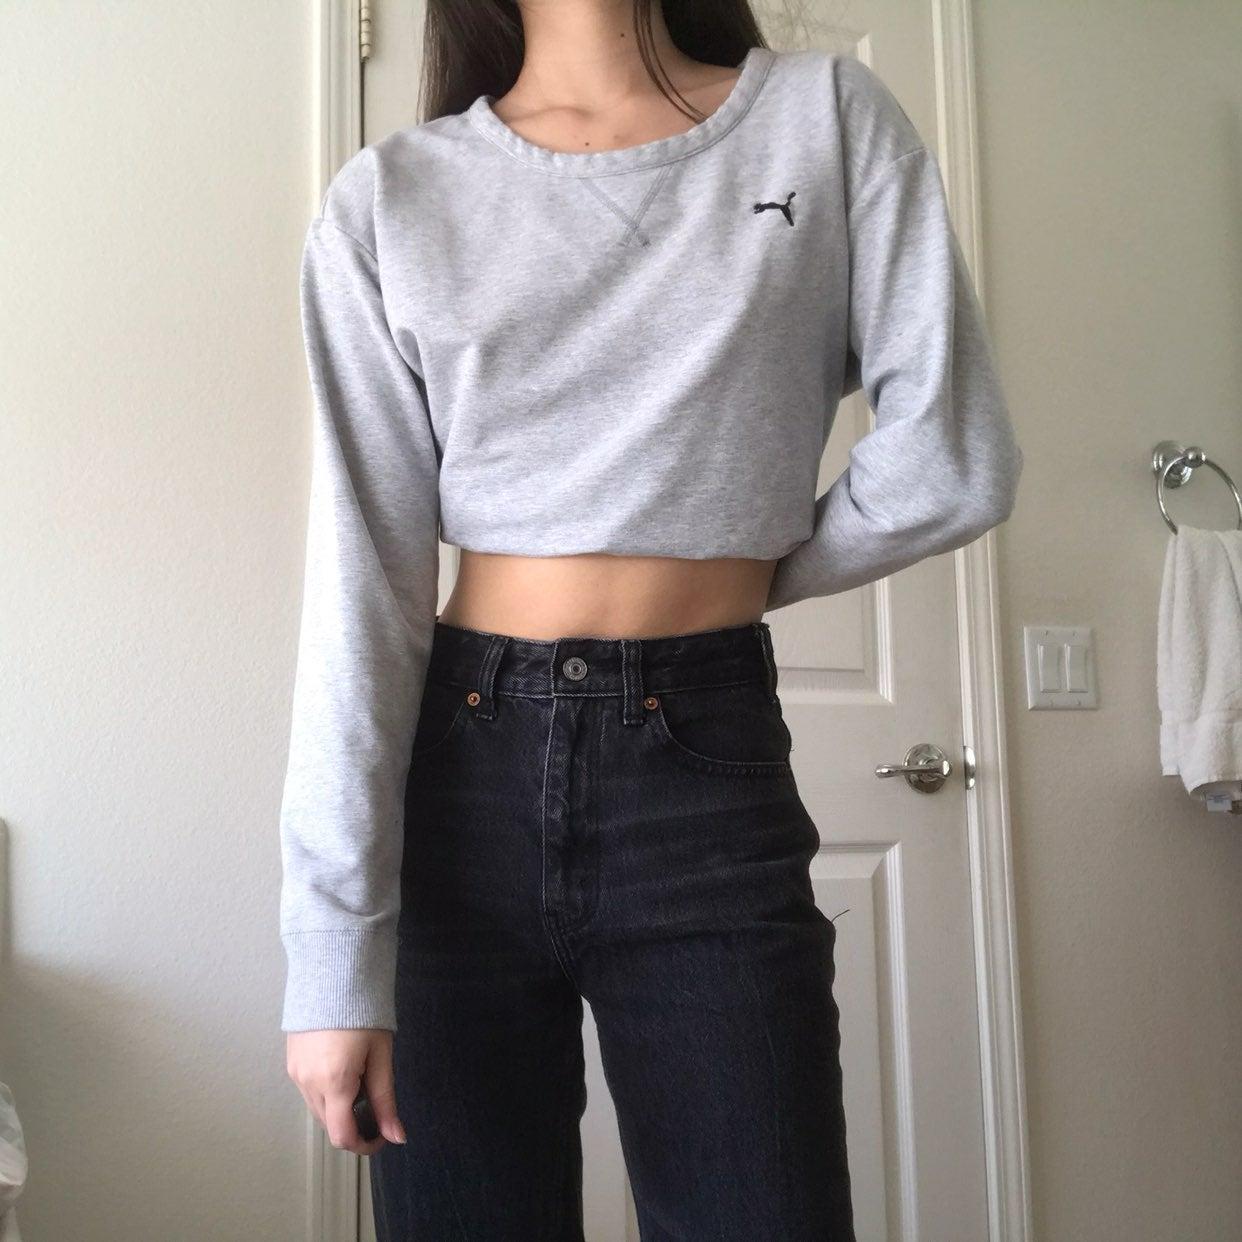 Puma Sweater with Cutout Back